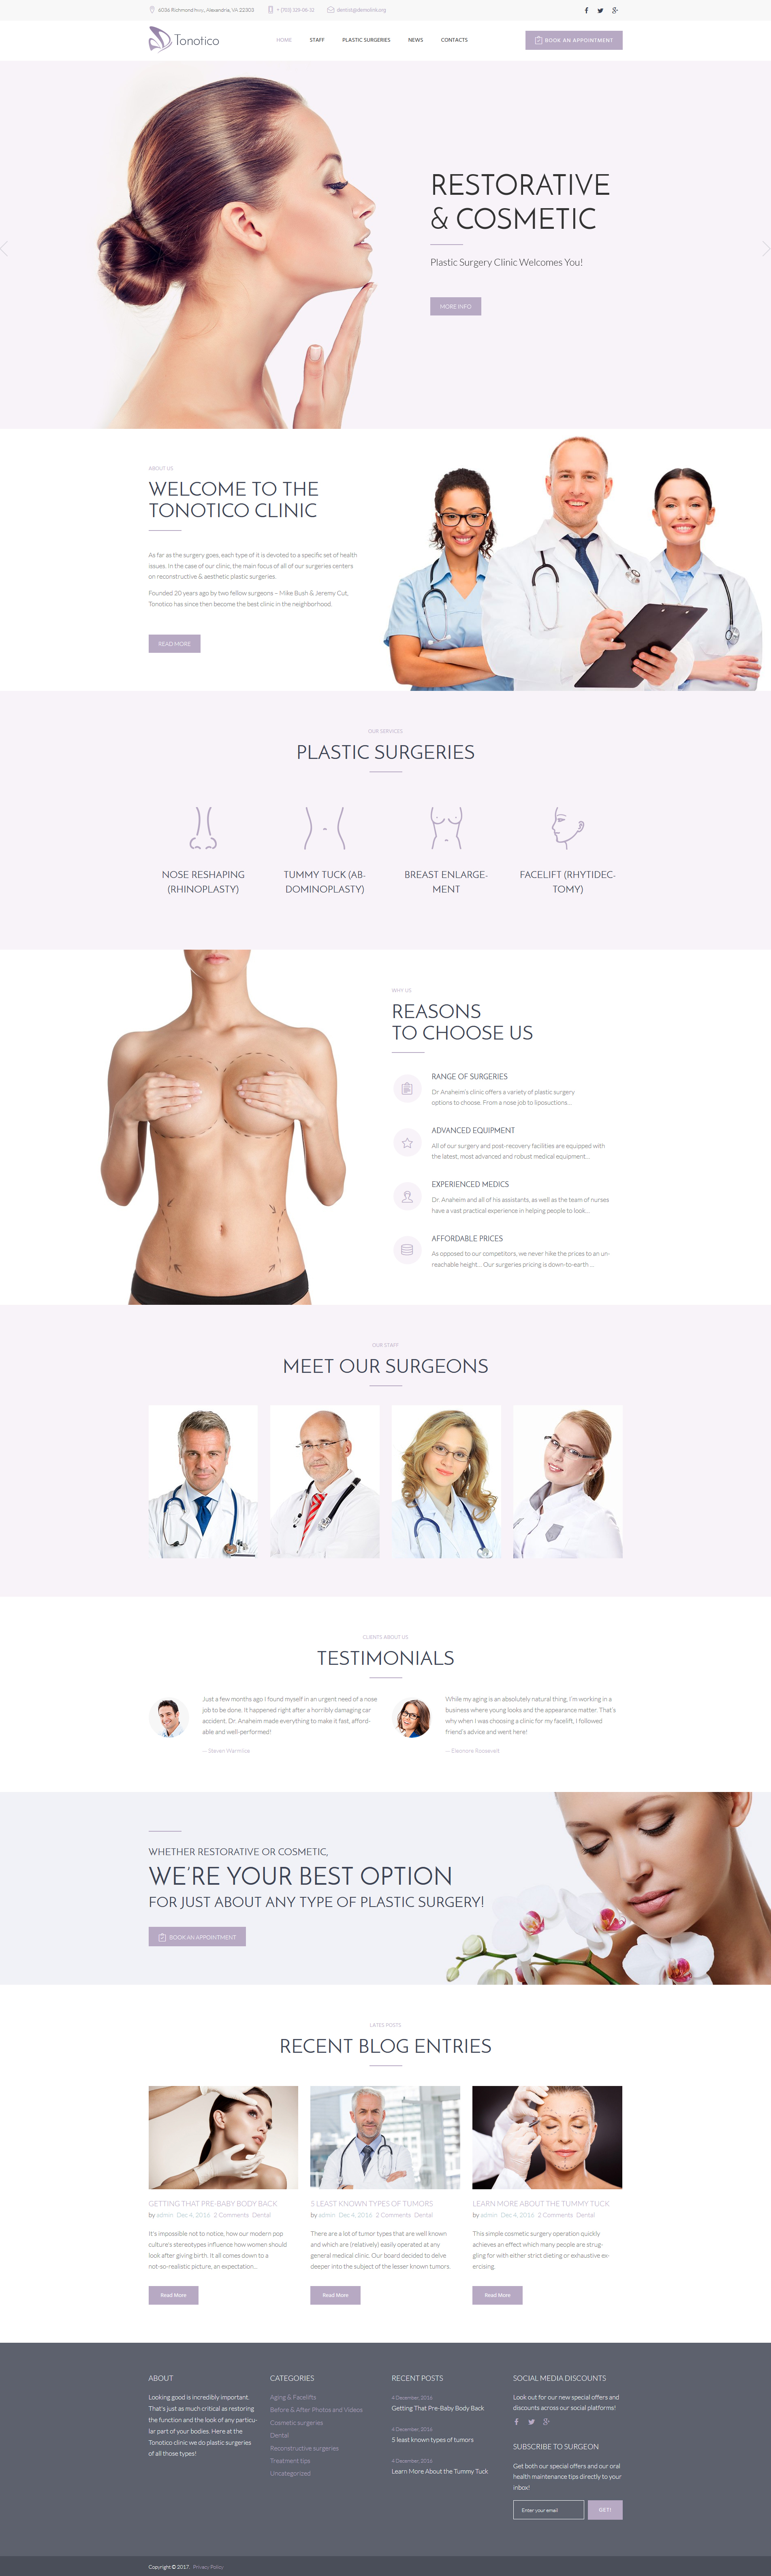 "WordPress Theme namens ""Tonotico - Plastic Surgery Clinic Responsive"" #64018"